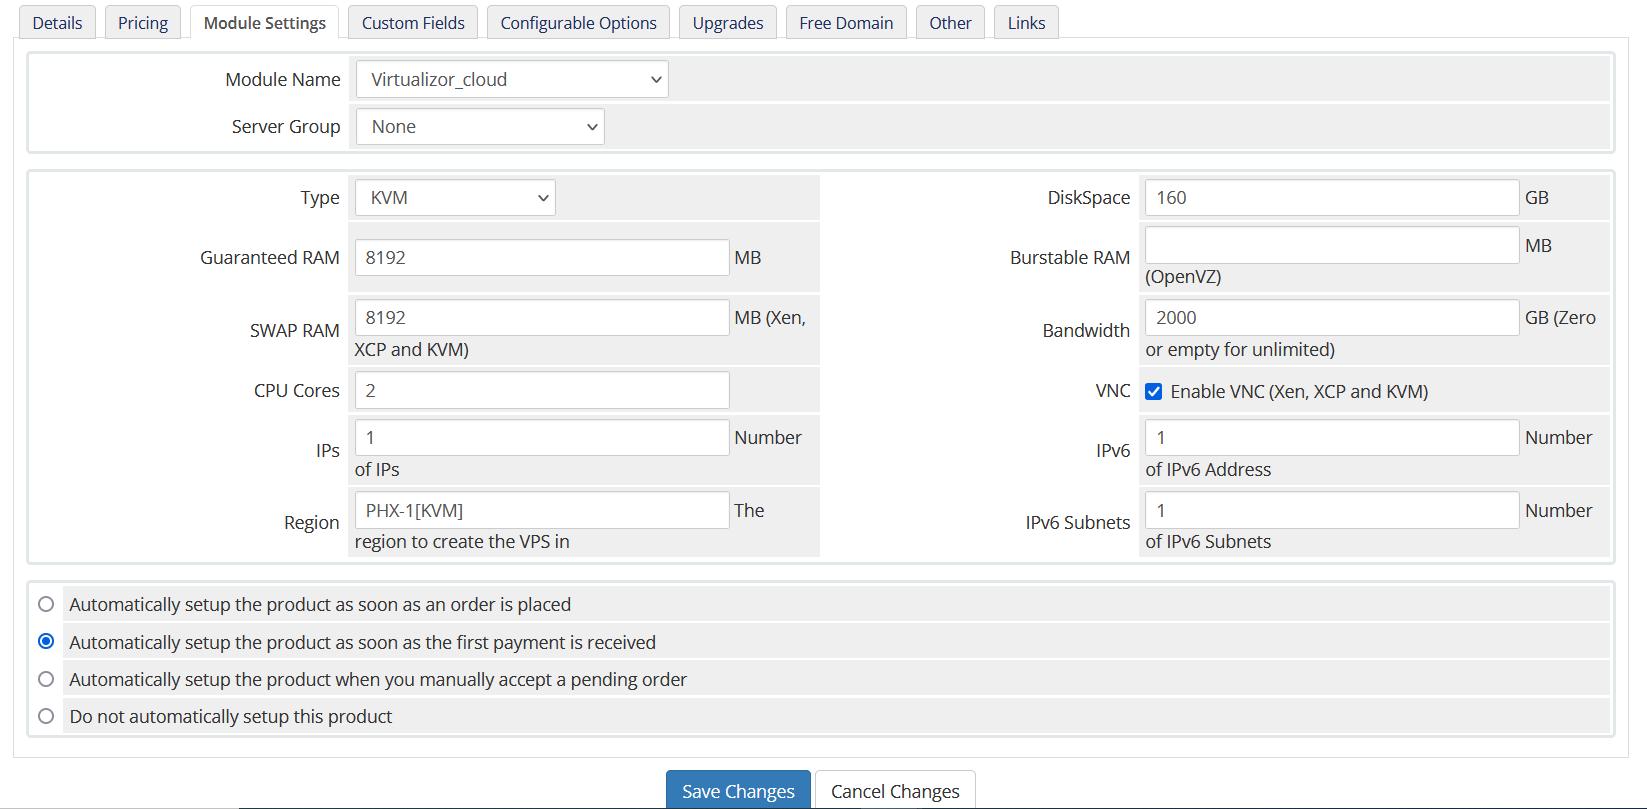 Configure product module settings